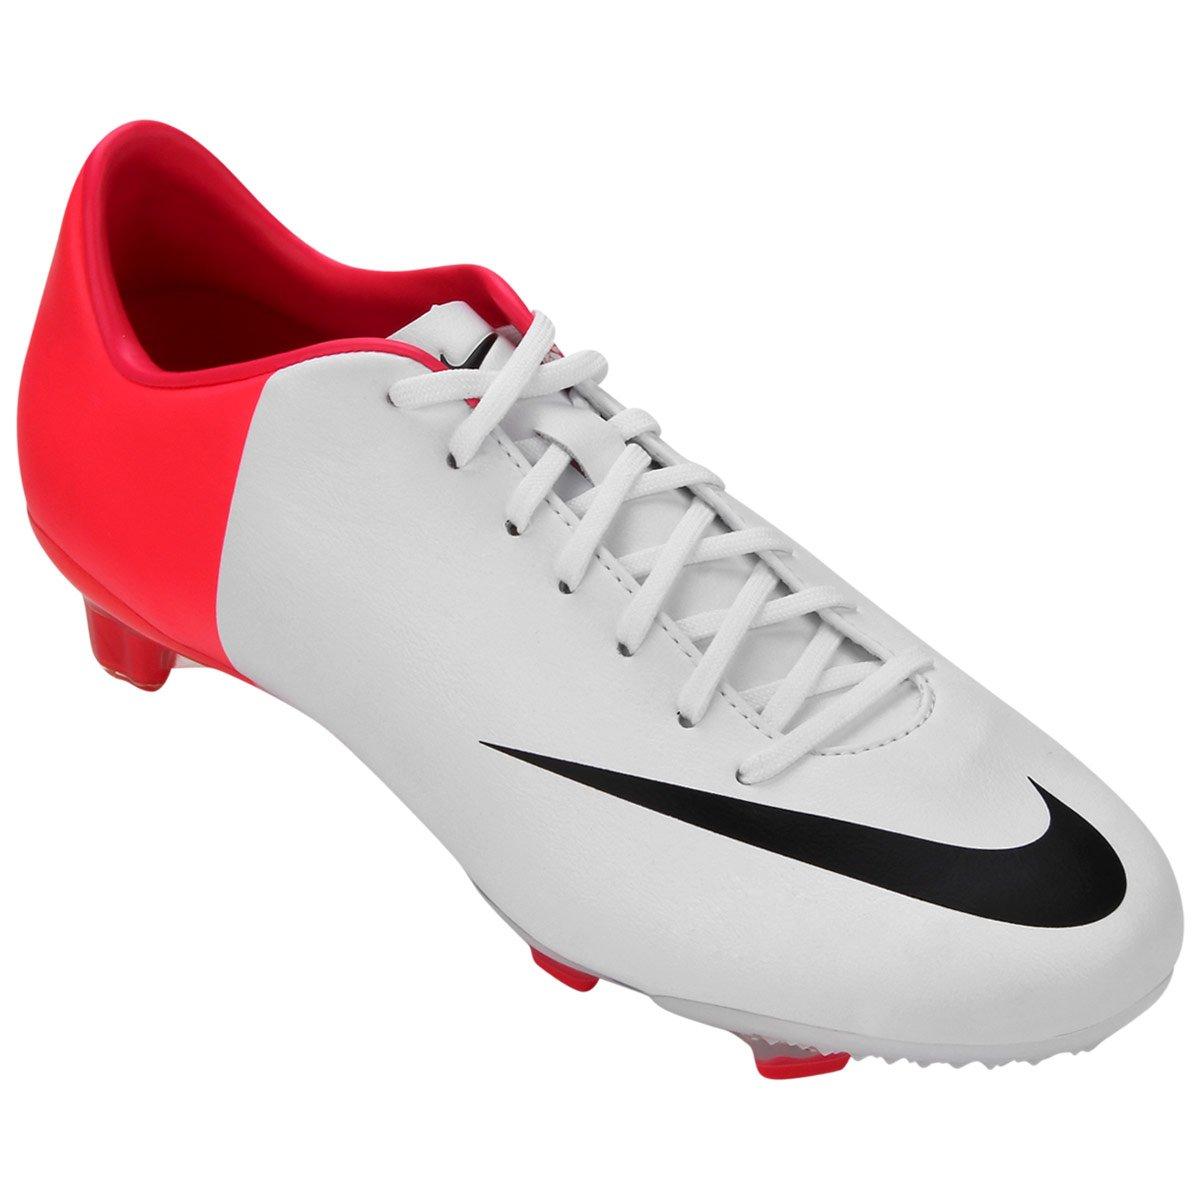 Chuteira Nike Mercurial Miracle 3 FG - Compre Agora  a7b8d83d87026